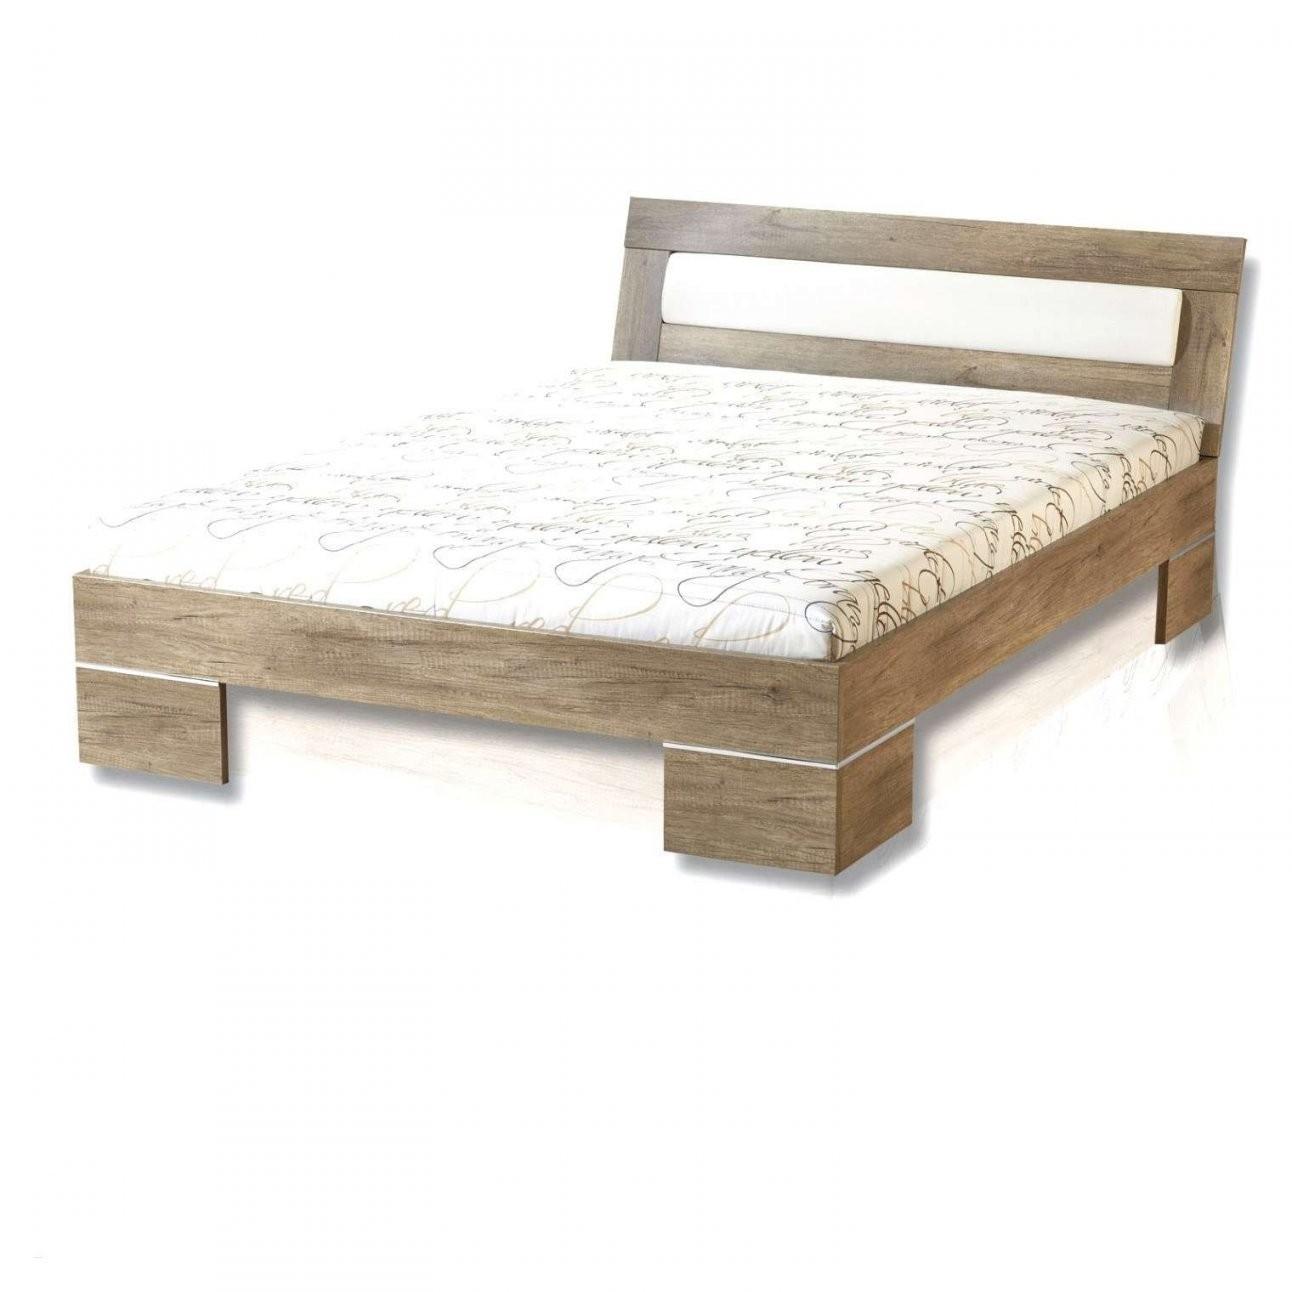 Doppelbett Gebraucht Neu 50 Neu Stabiles Bett 140×200 Stock von Stabiles Bett 140X200 Photo